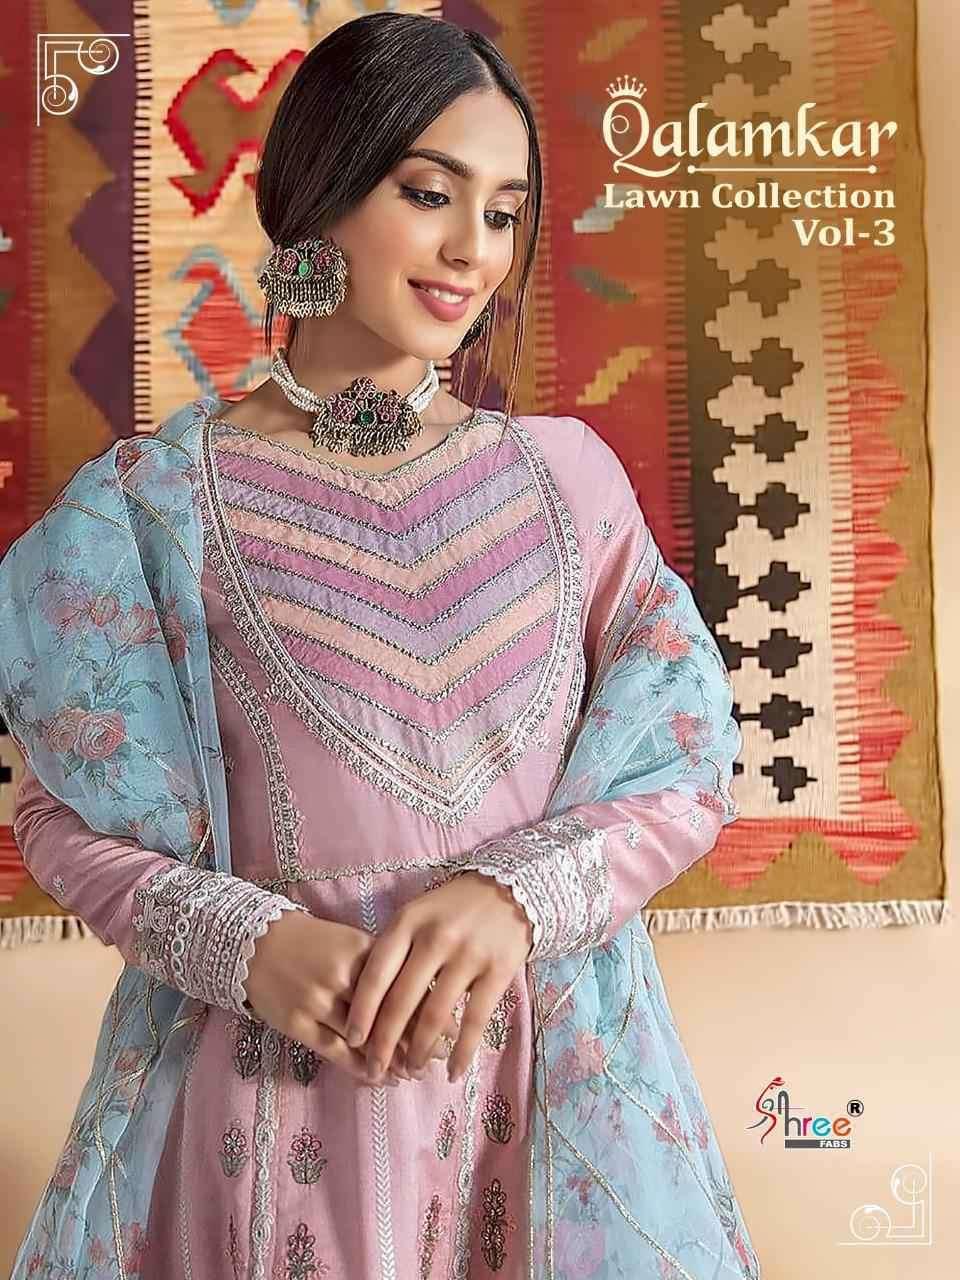 Shree Fabs Qalamkar Lawn Collection Vol 3 Exclusive Fancy Pakistani Ladies Suits